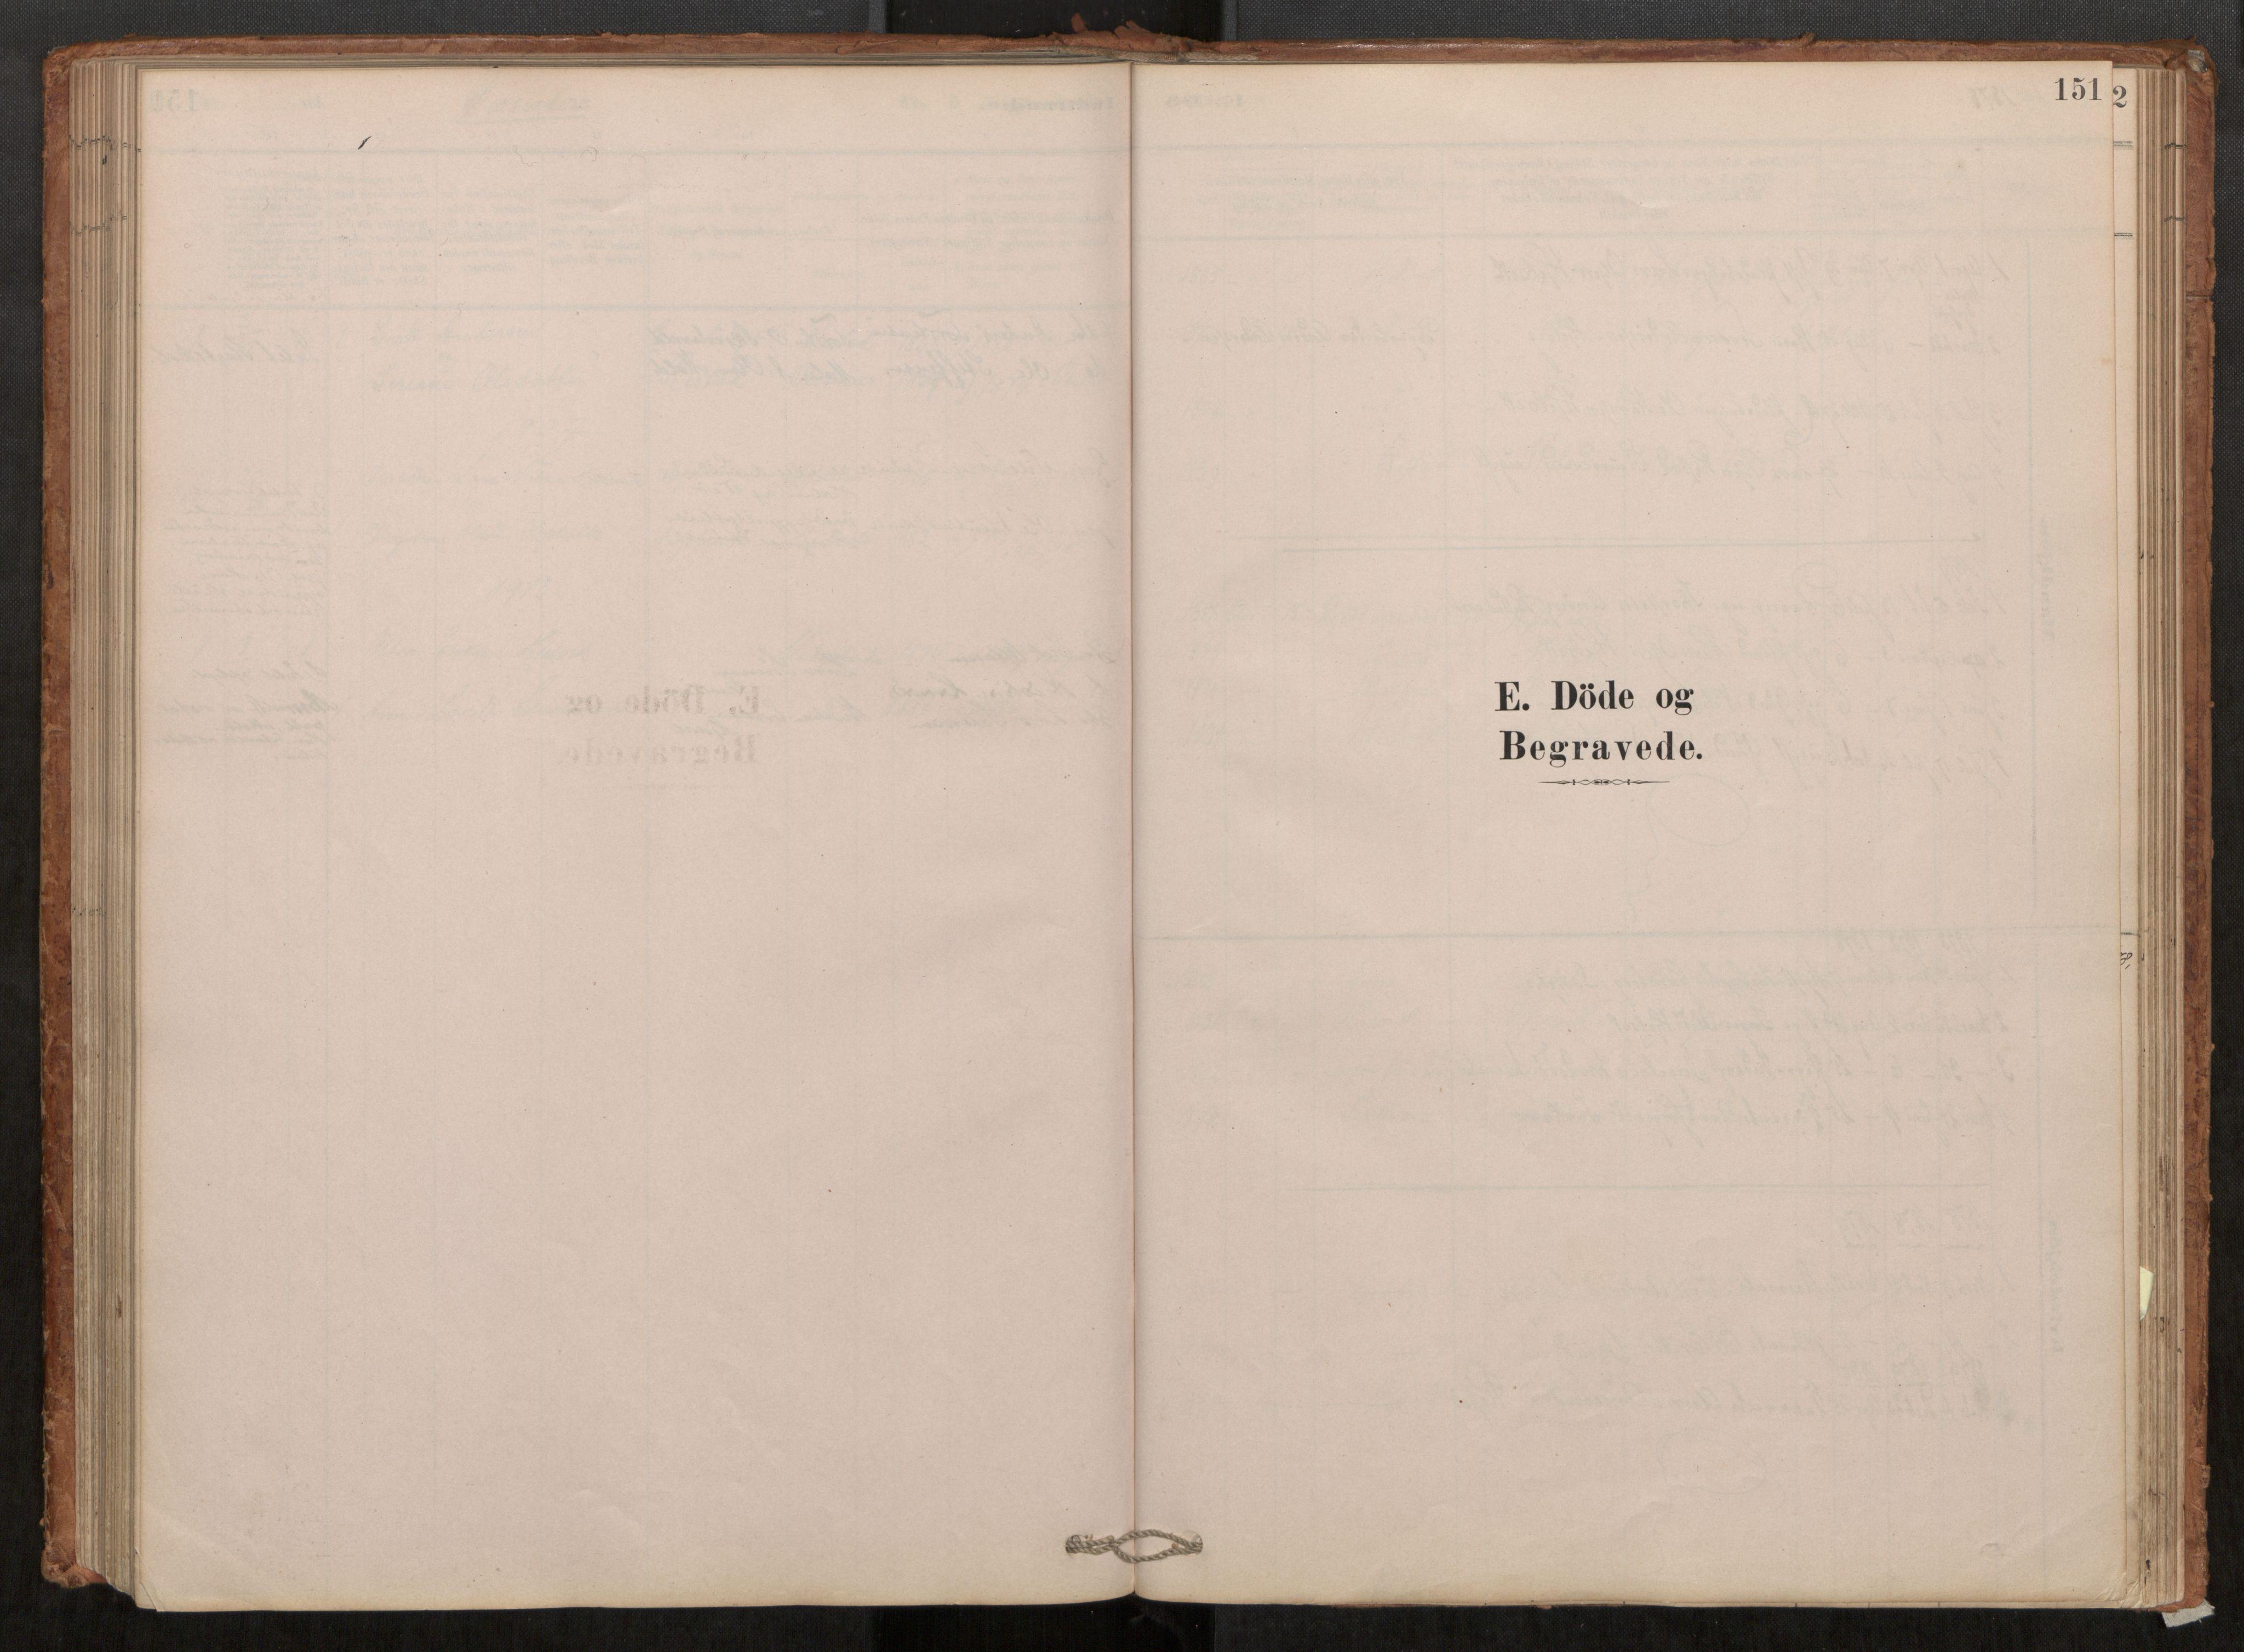 SAT, Grytten sokneprestkontor, Ministerialbok nr. 550A01, 1878-1915, s. 151